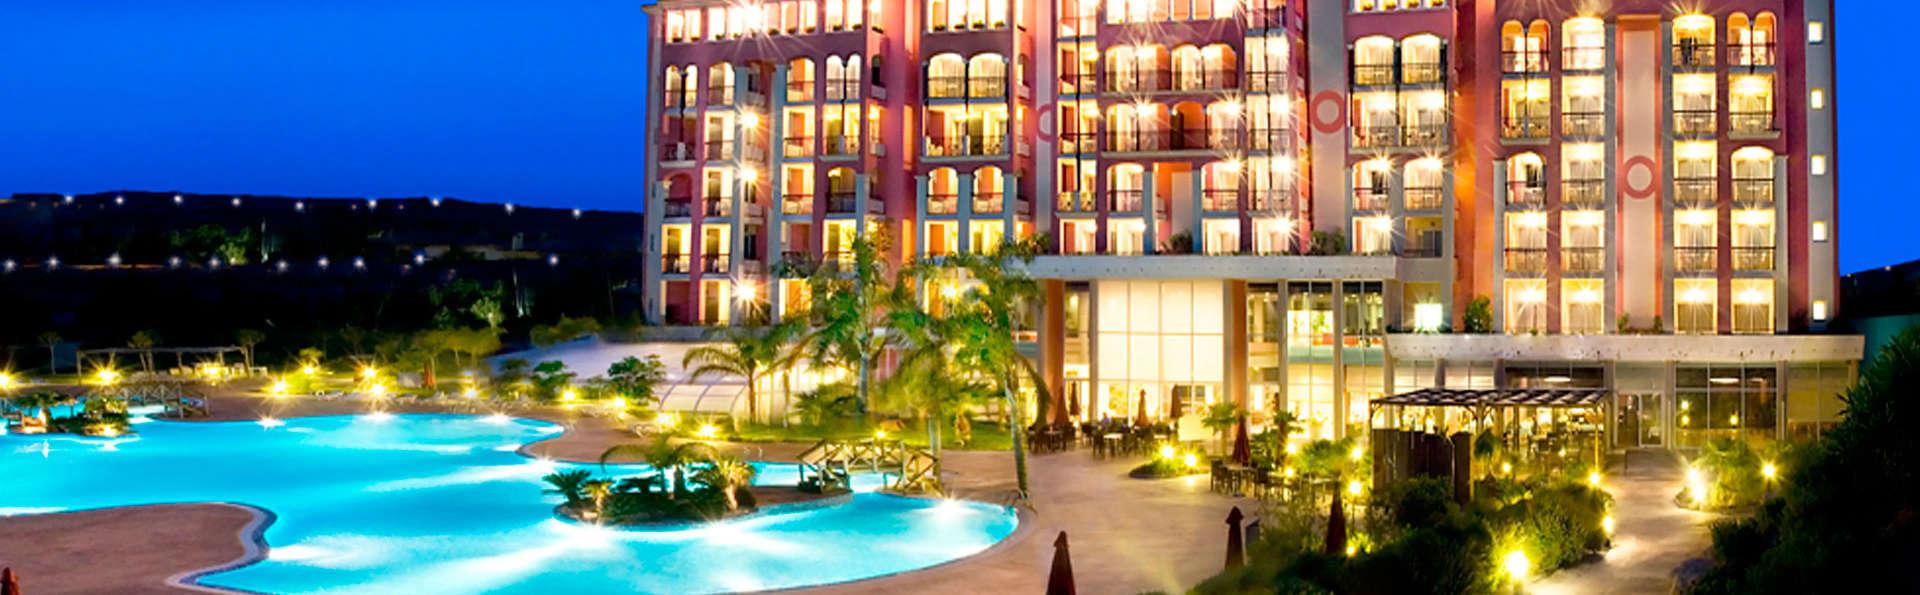 Sercotel Hotel Bonalba Alicante - edit_front3121.jpg